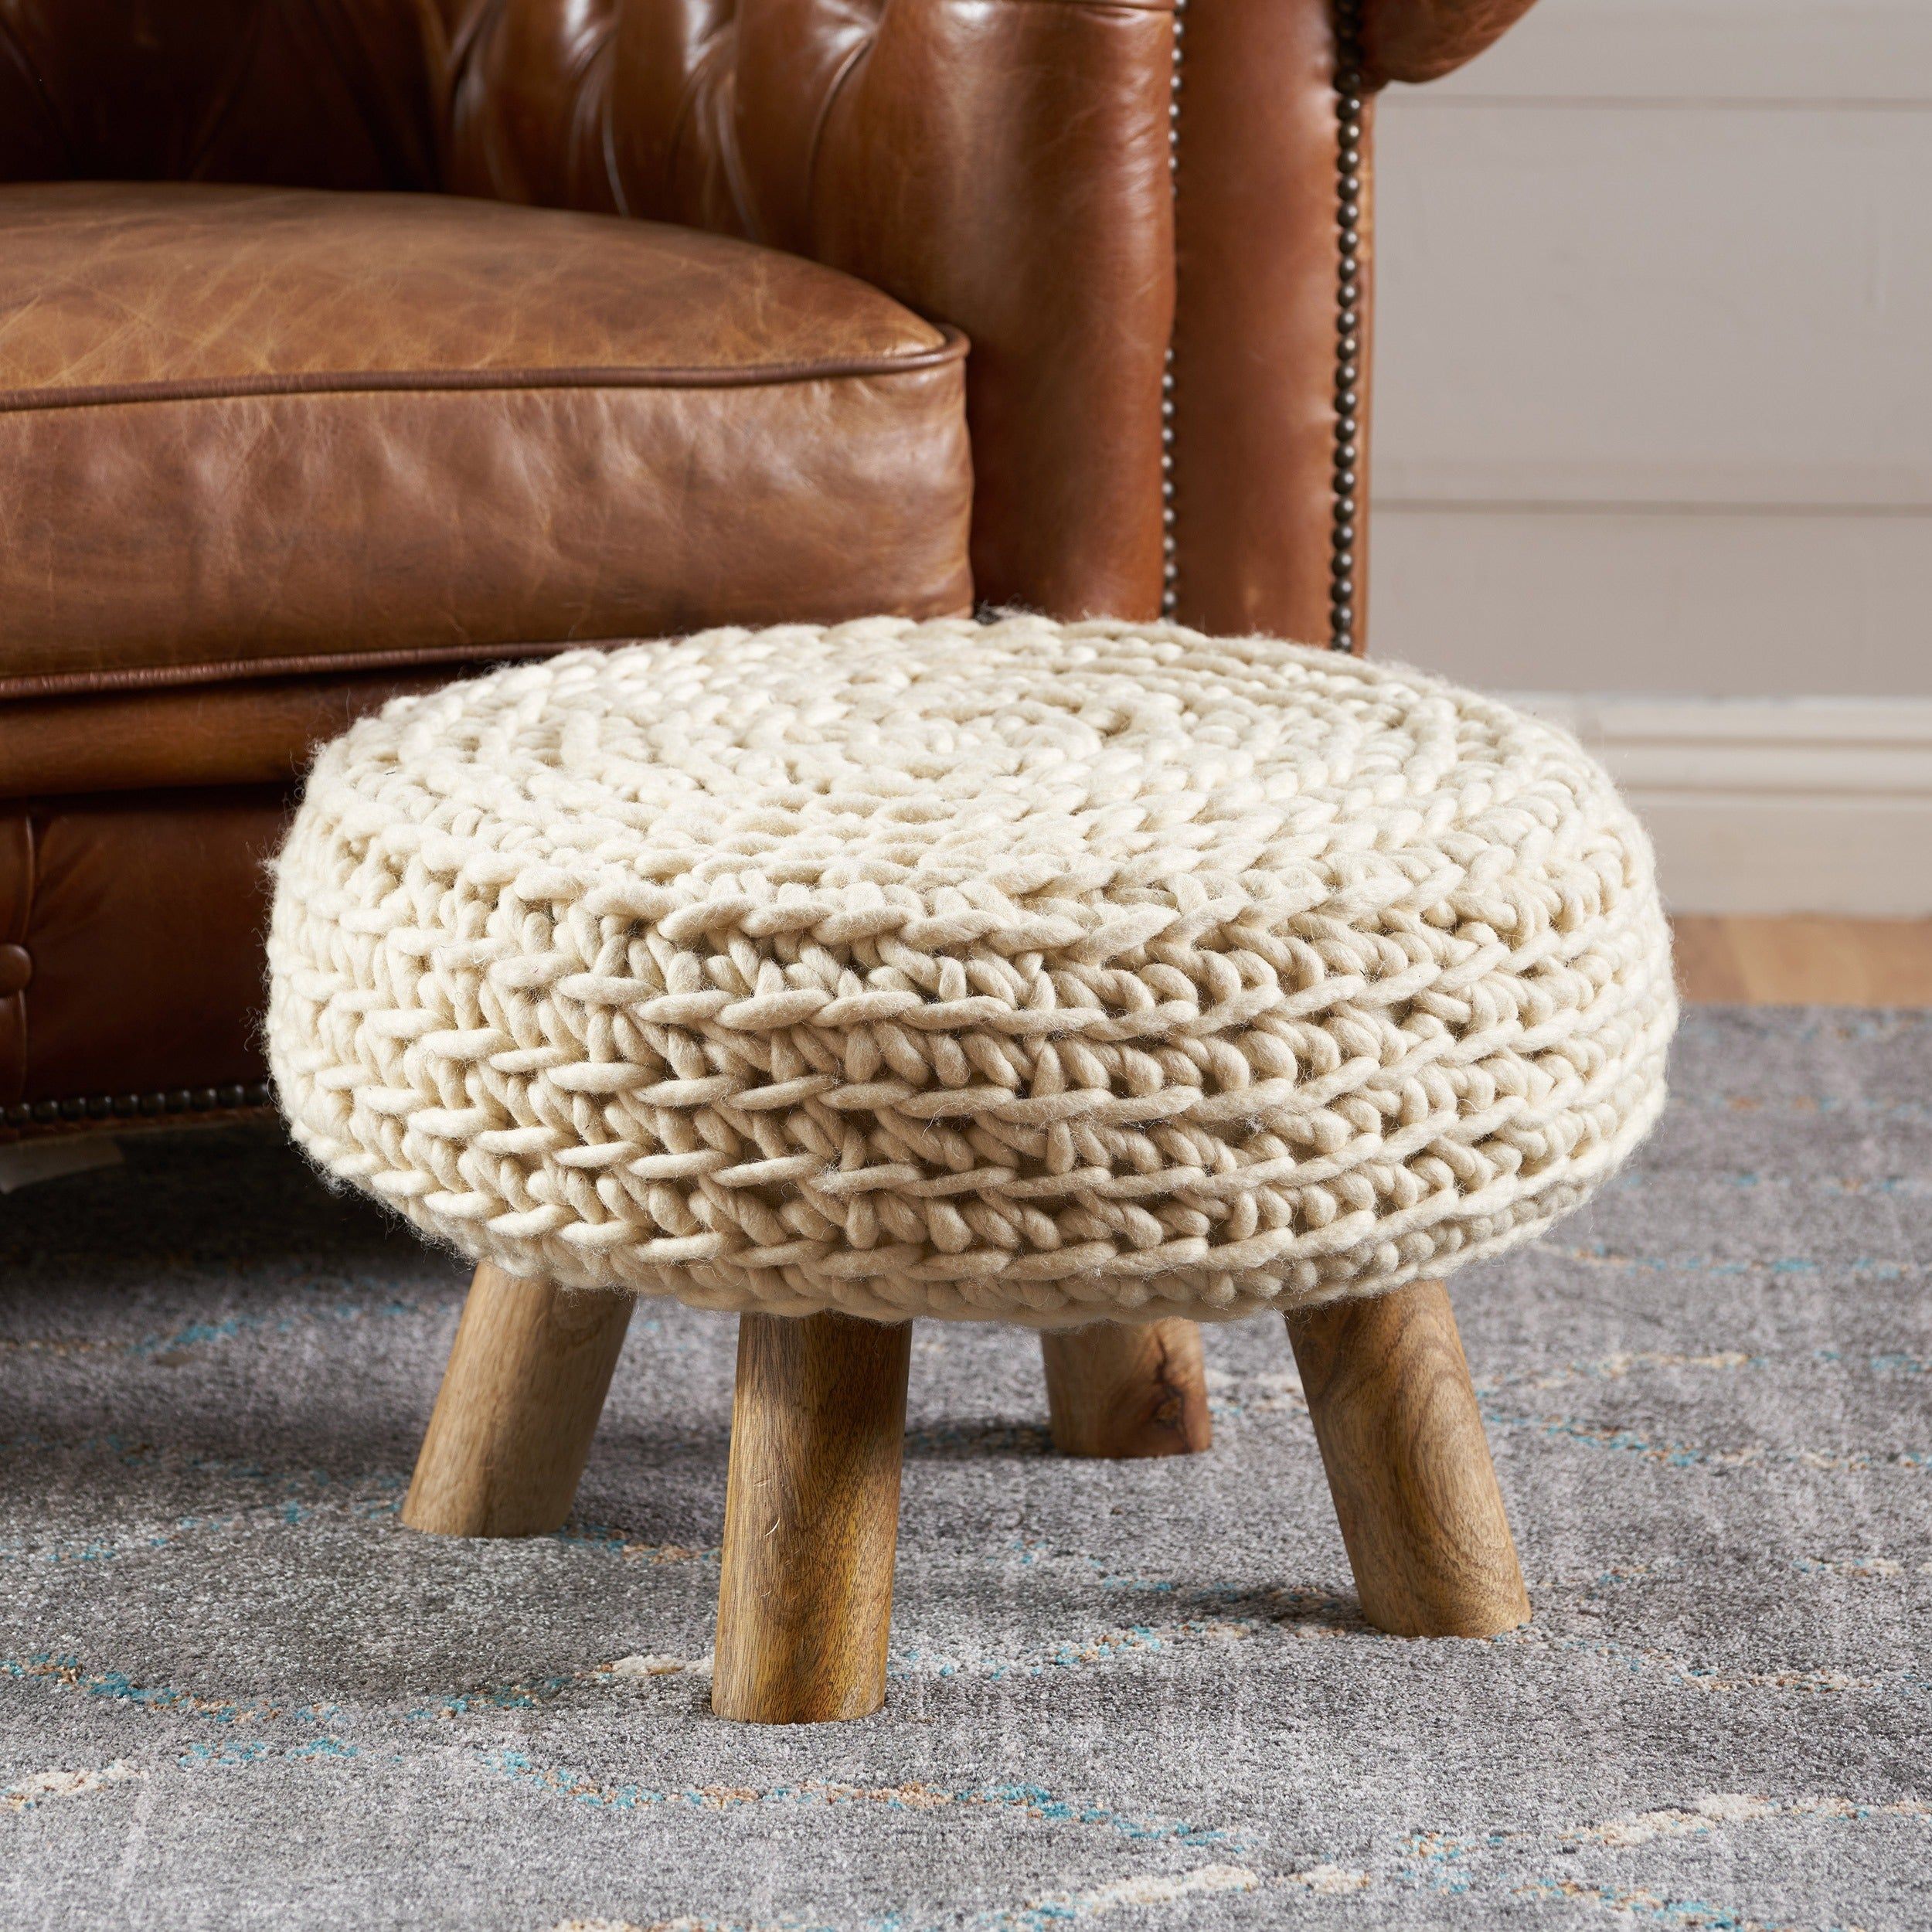 Fabulous Darrow Fabric Round Ottoman Stool By Christopher Knight Home Machost Co Dining Chair Design Ideas Machostcouk